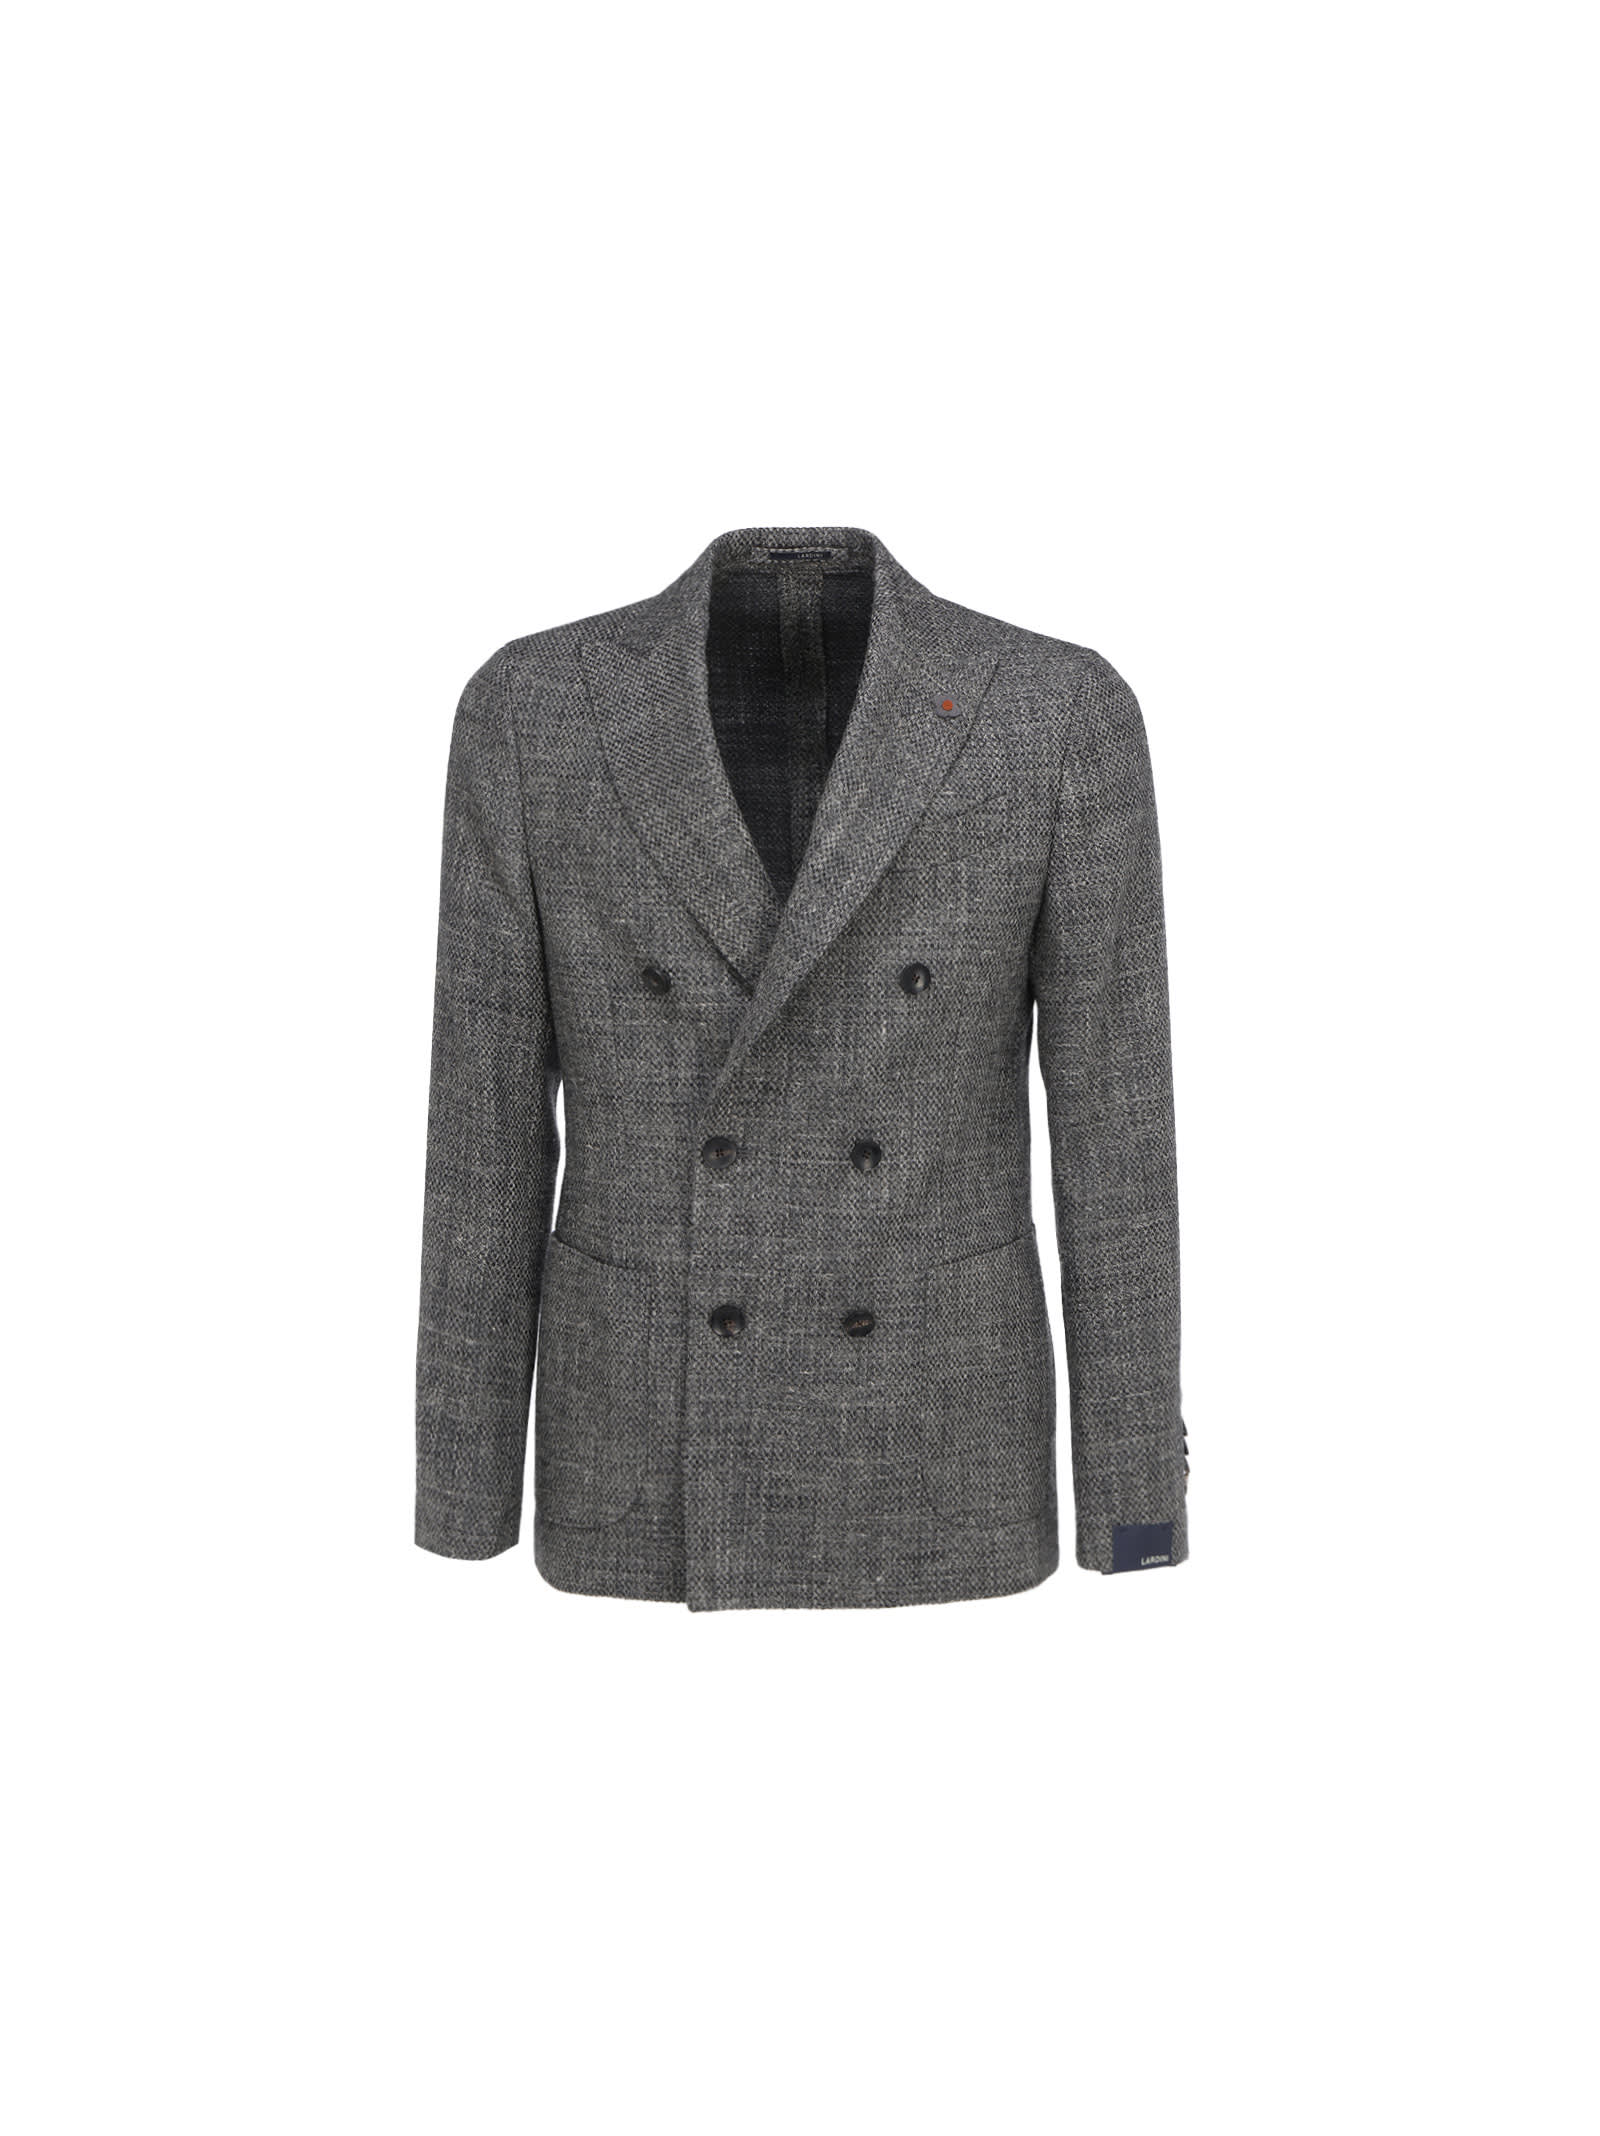 Lardini Jacket In Grey